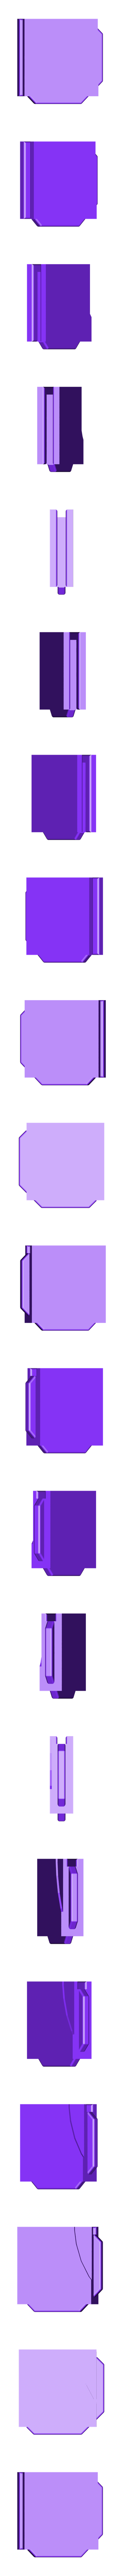 Piece - Part 8.stl Download free STL file Taquin CULTS / Sliding Puzzle • 3D print model, Valelab3D